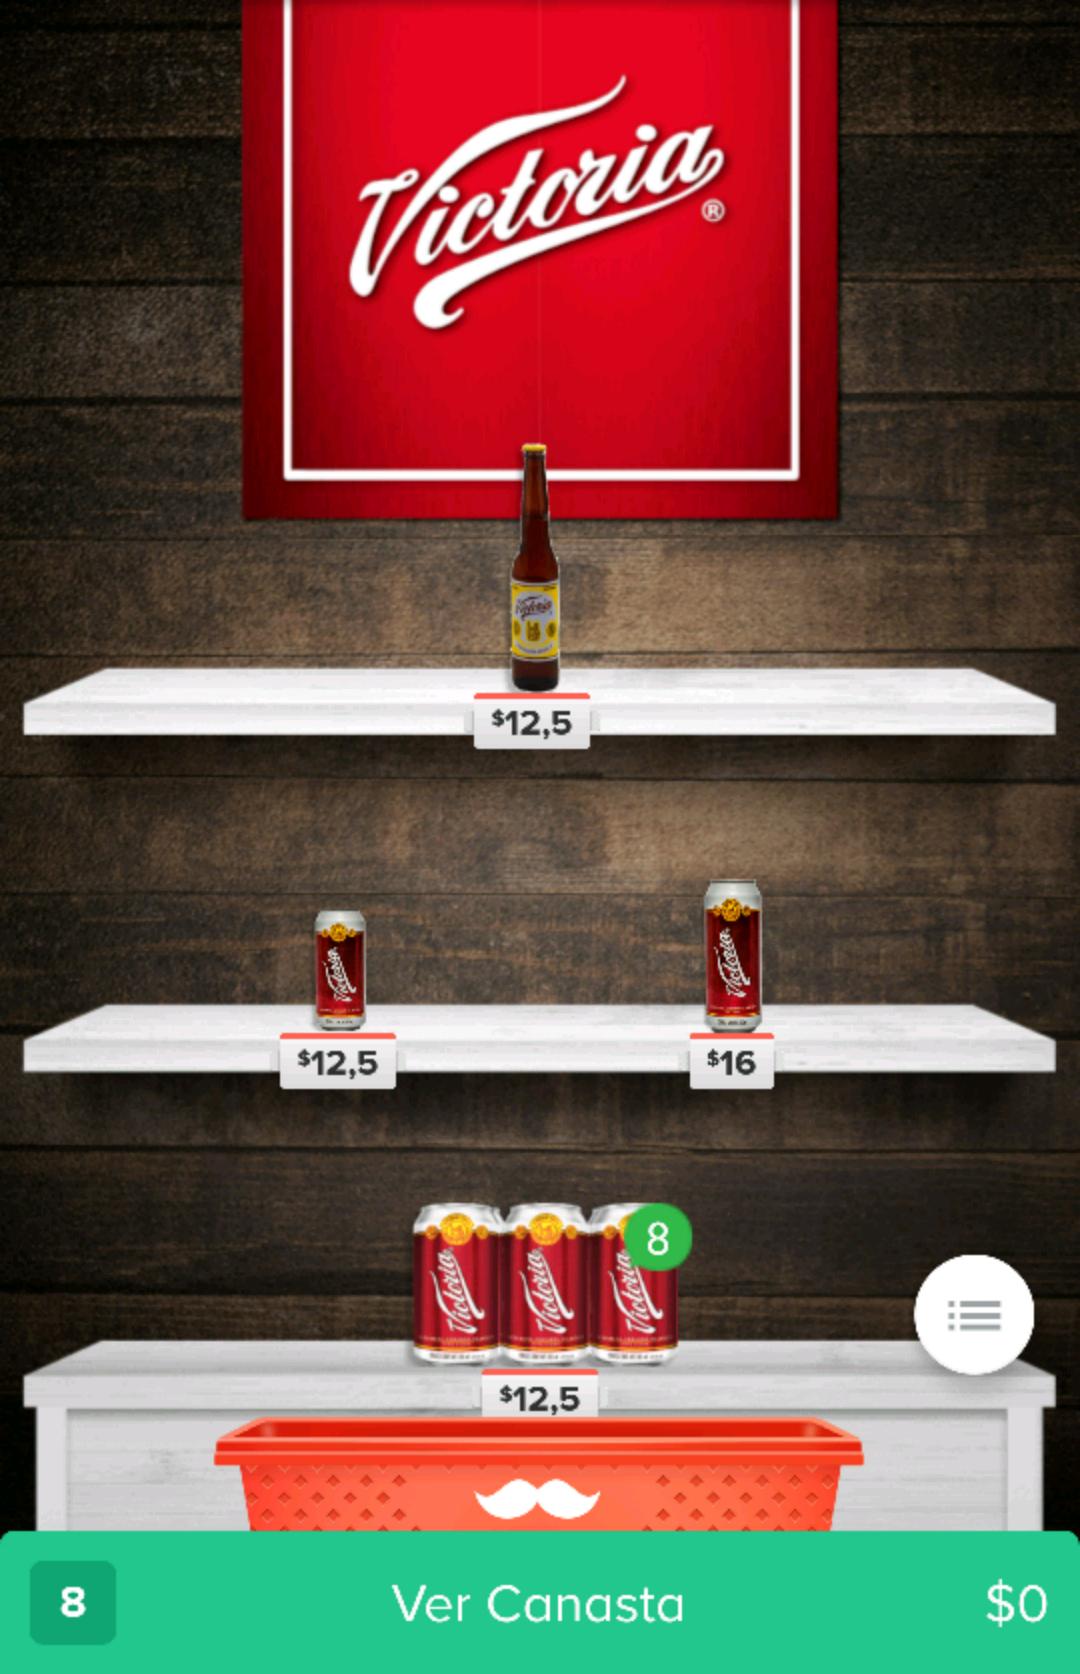 Rappi: 6pack de cerveza victoria y corona light 12.5 promonovela